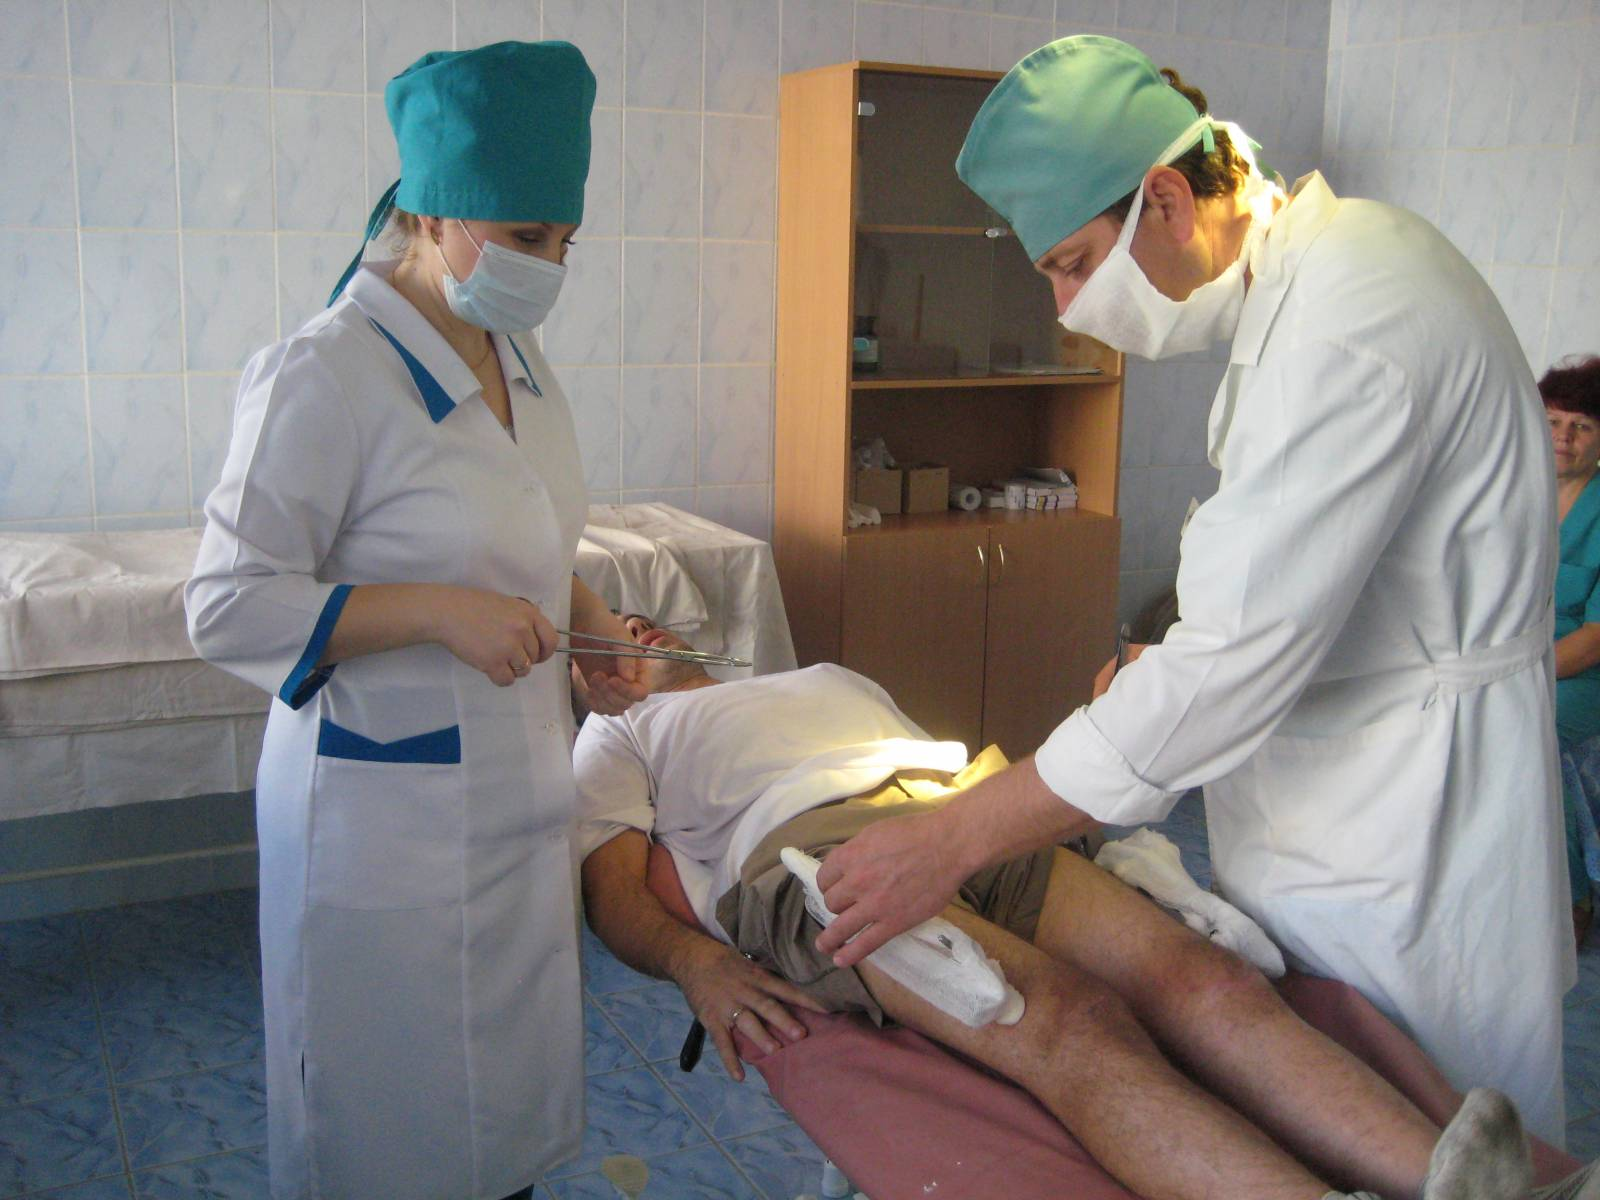 Травматология фото